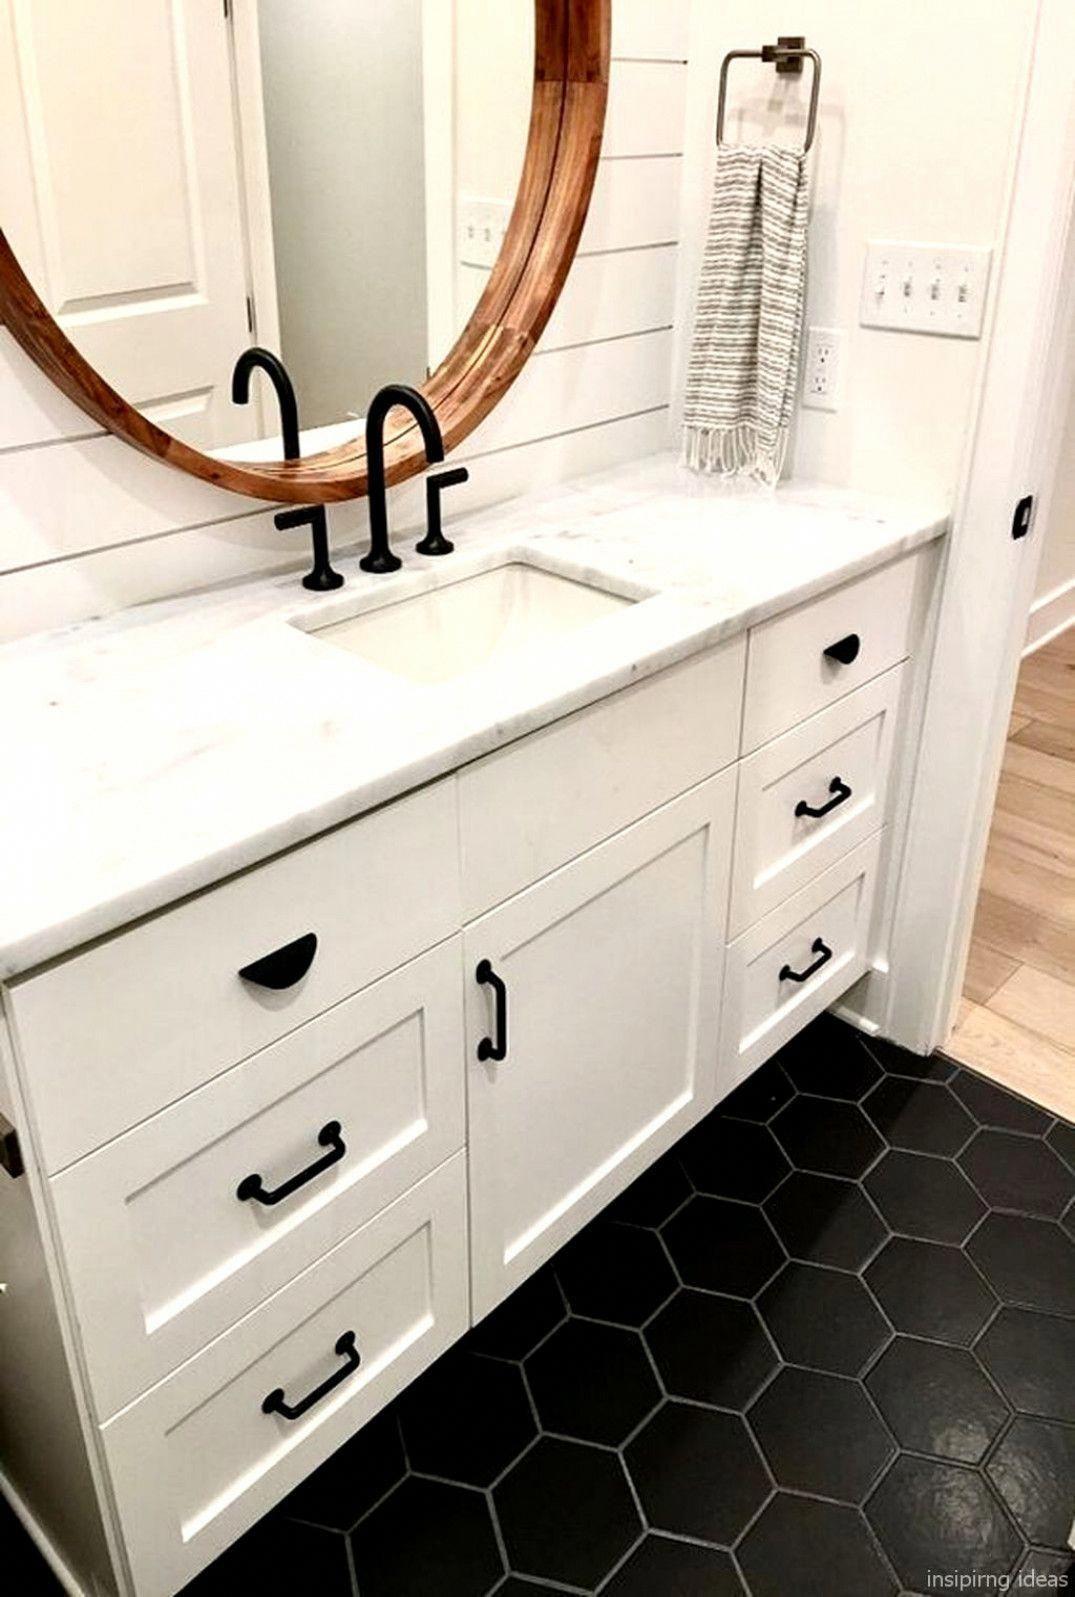 32 Awesome Modern Farmhouse Bathroom Vanity Ideas Kitchenremodelcost Modernhomedecorbathroom Badezimmer Design Badezimmer S Badezimmer Klein